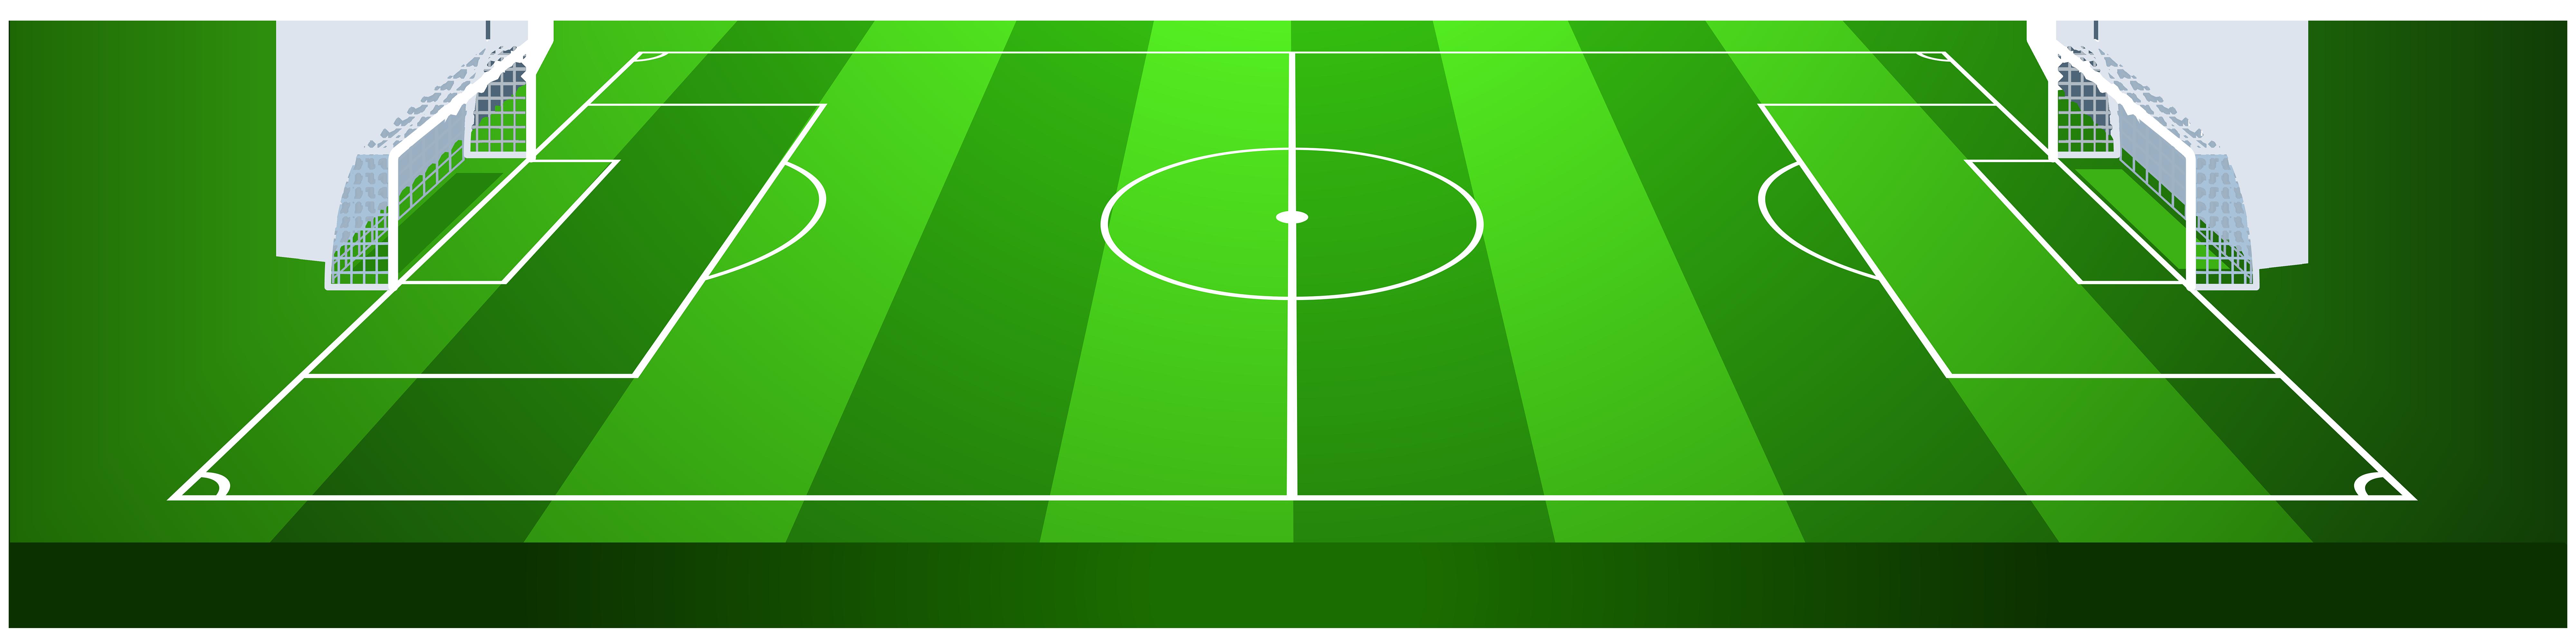 Gate clipart soccer. Field png transparent clip